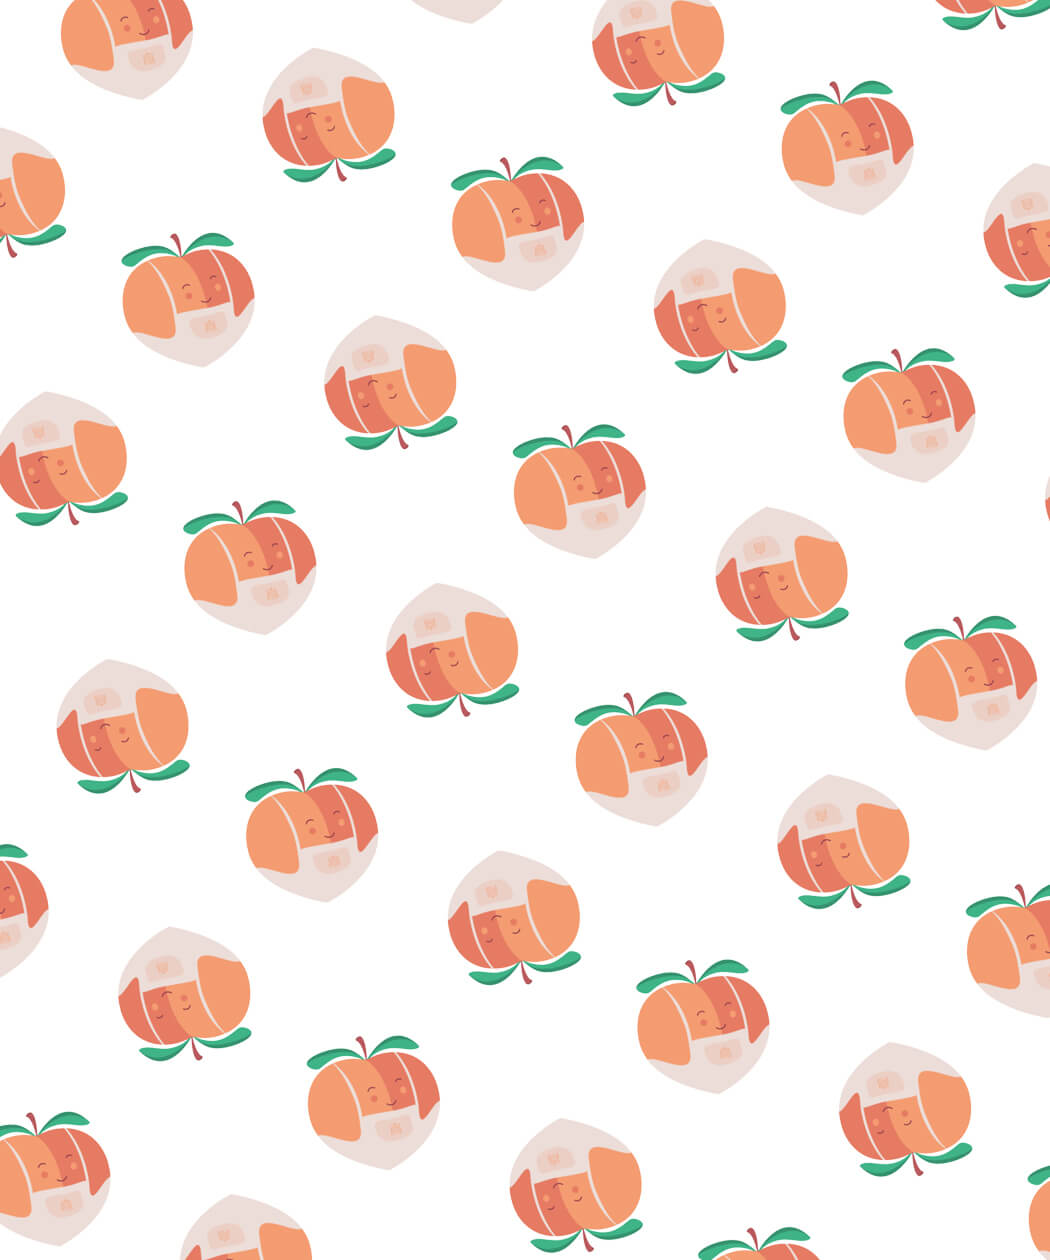 Peach Patisserie repeat icon pattern design for print